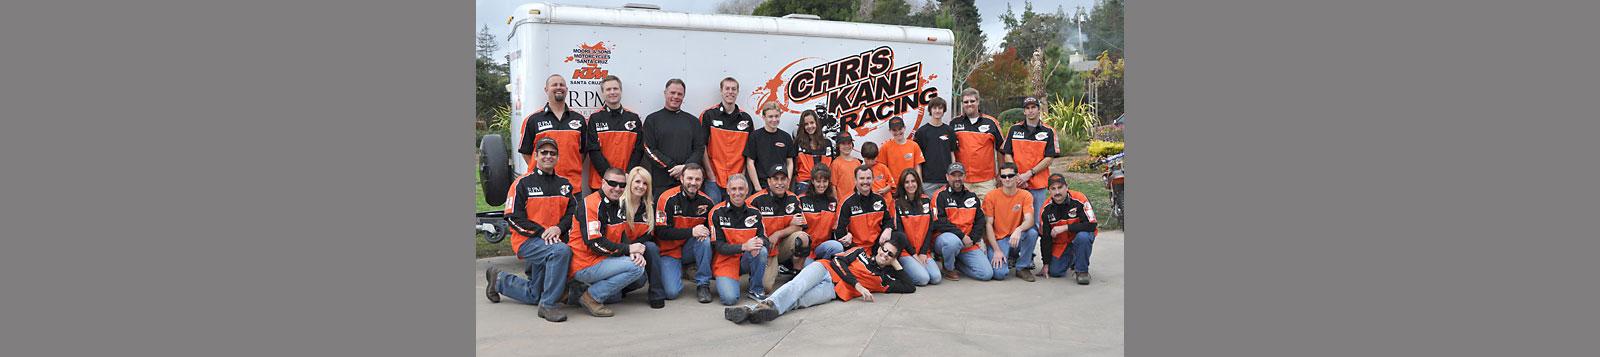 Chris Kane Racing team photo